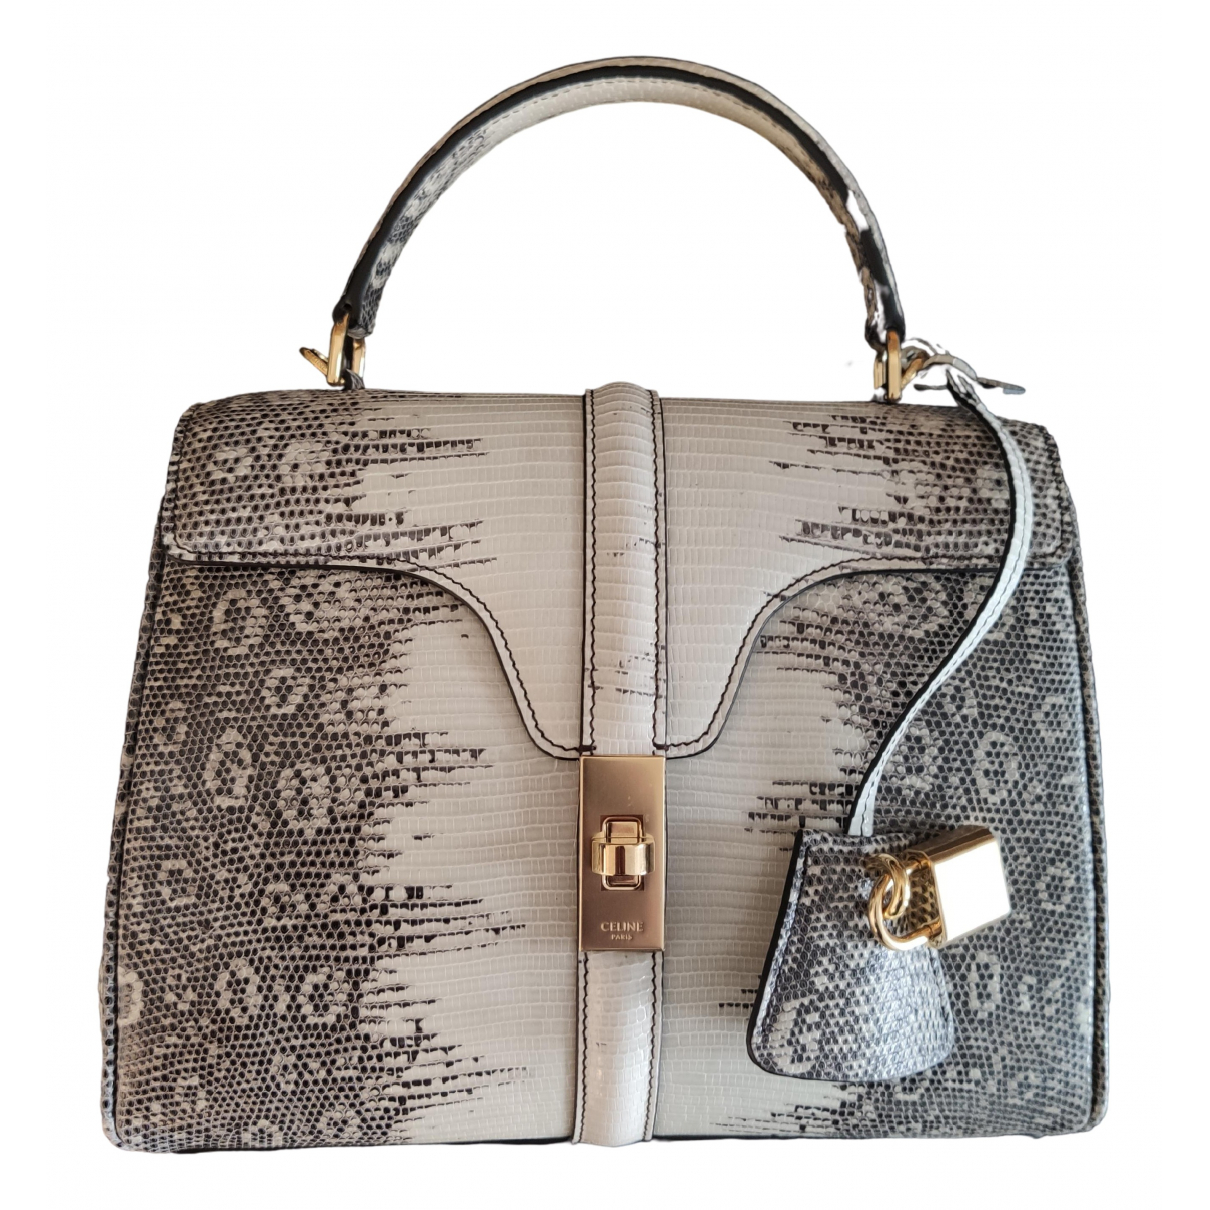 Celine Sac 16 Lizard handbag for Women \N